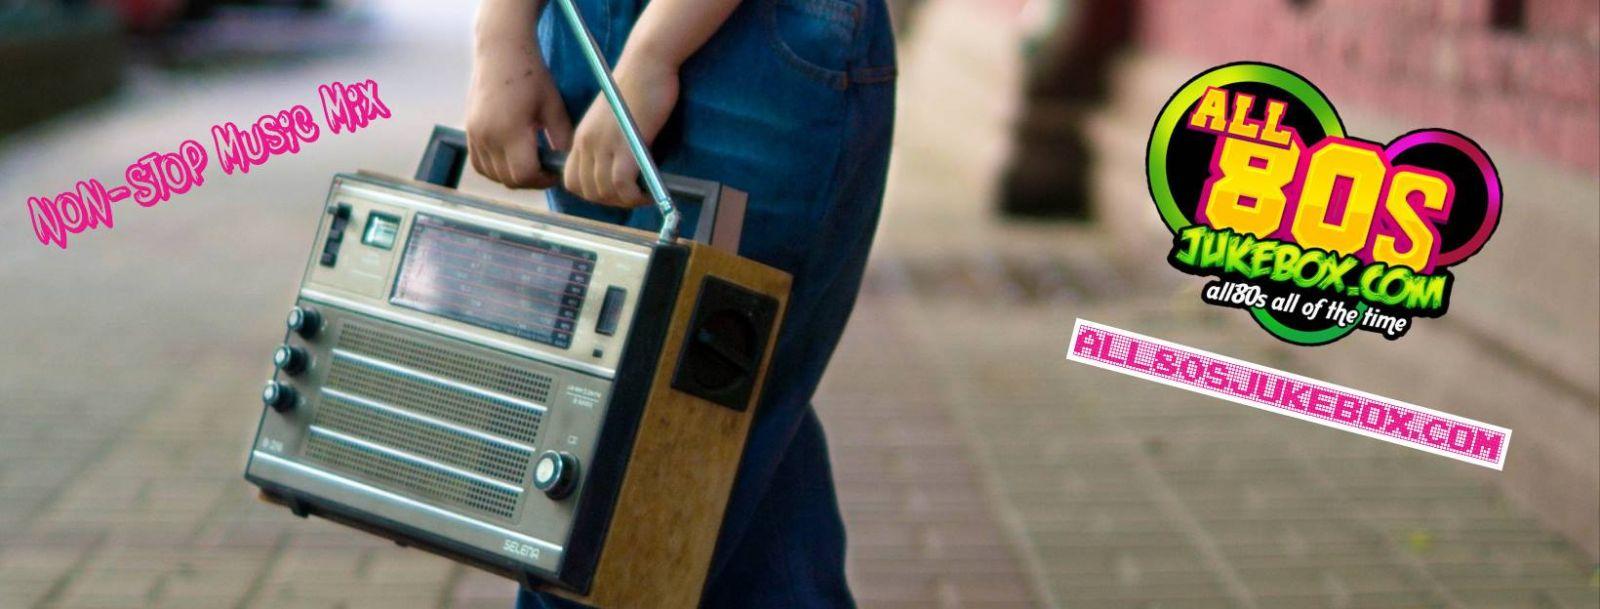 80s Music Radio Stations Online Available 24 7 On LiveRadio Internet Platform